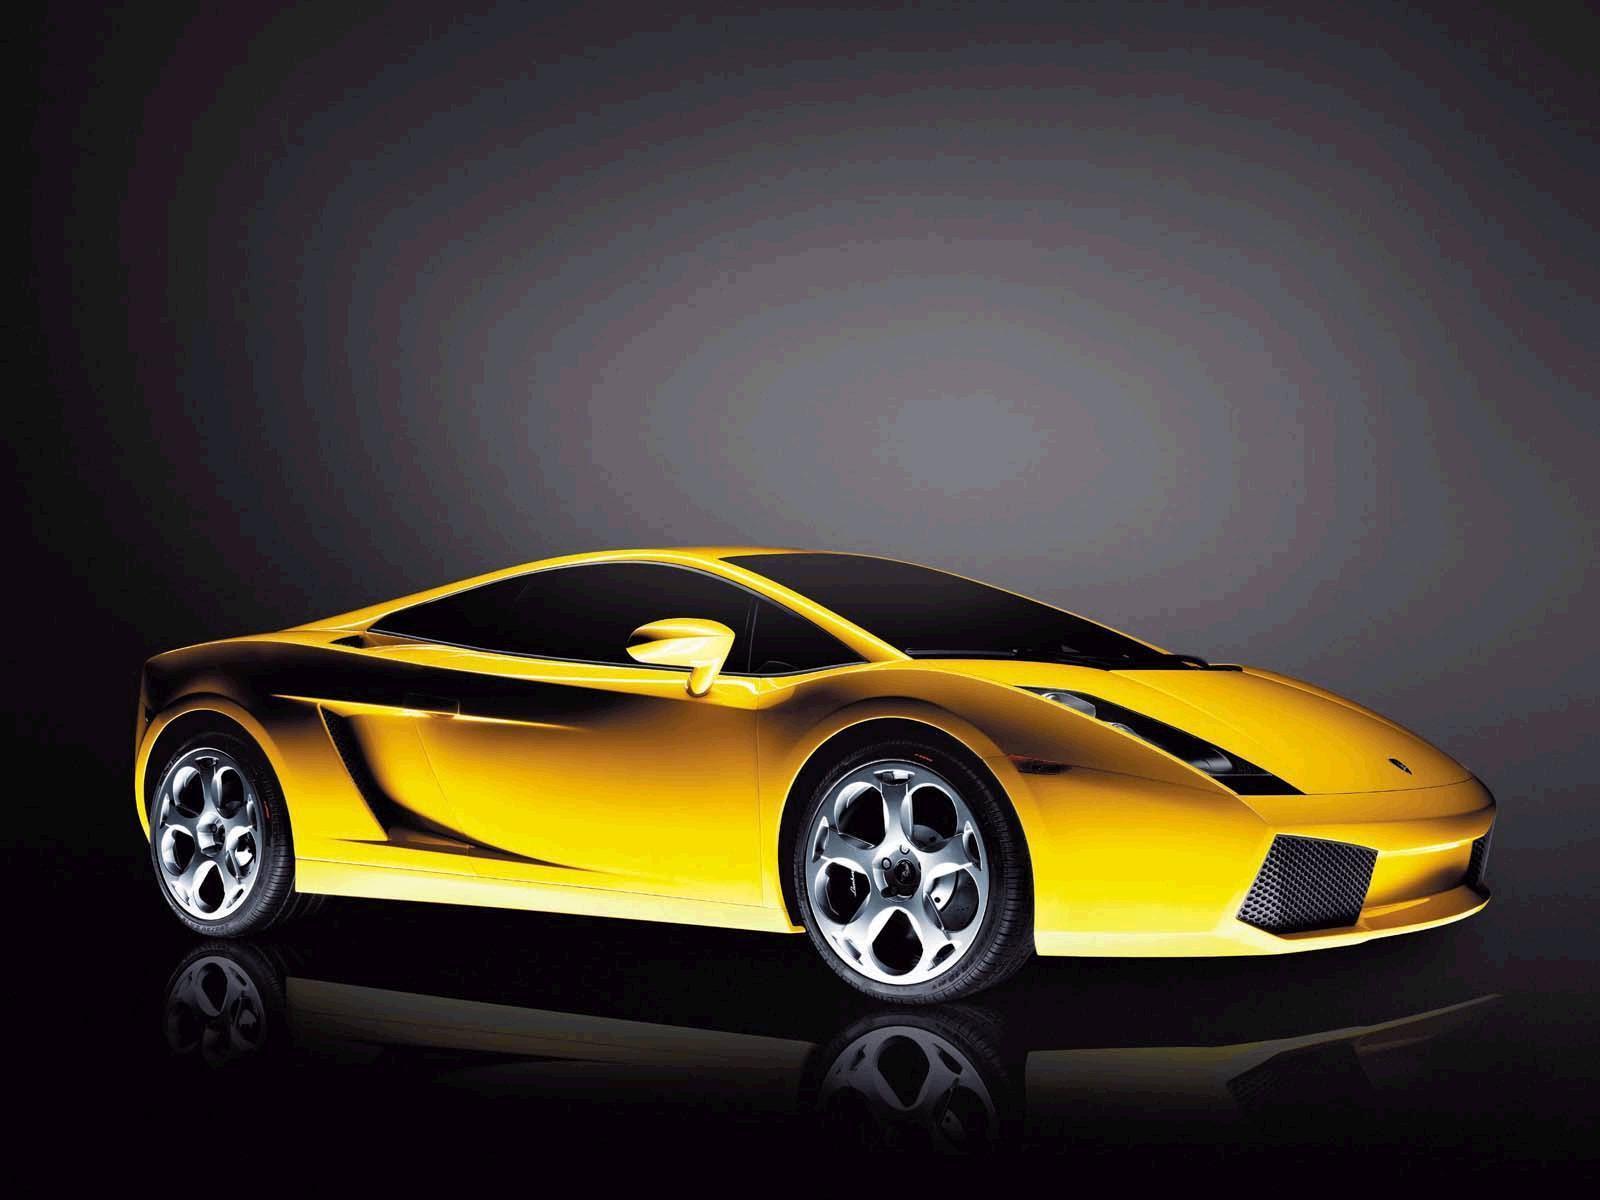 Mobil Aventador Lamborghini Aventador J Wallpaper Hd Lamborghini